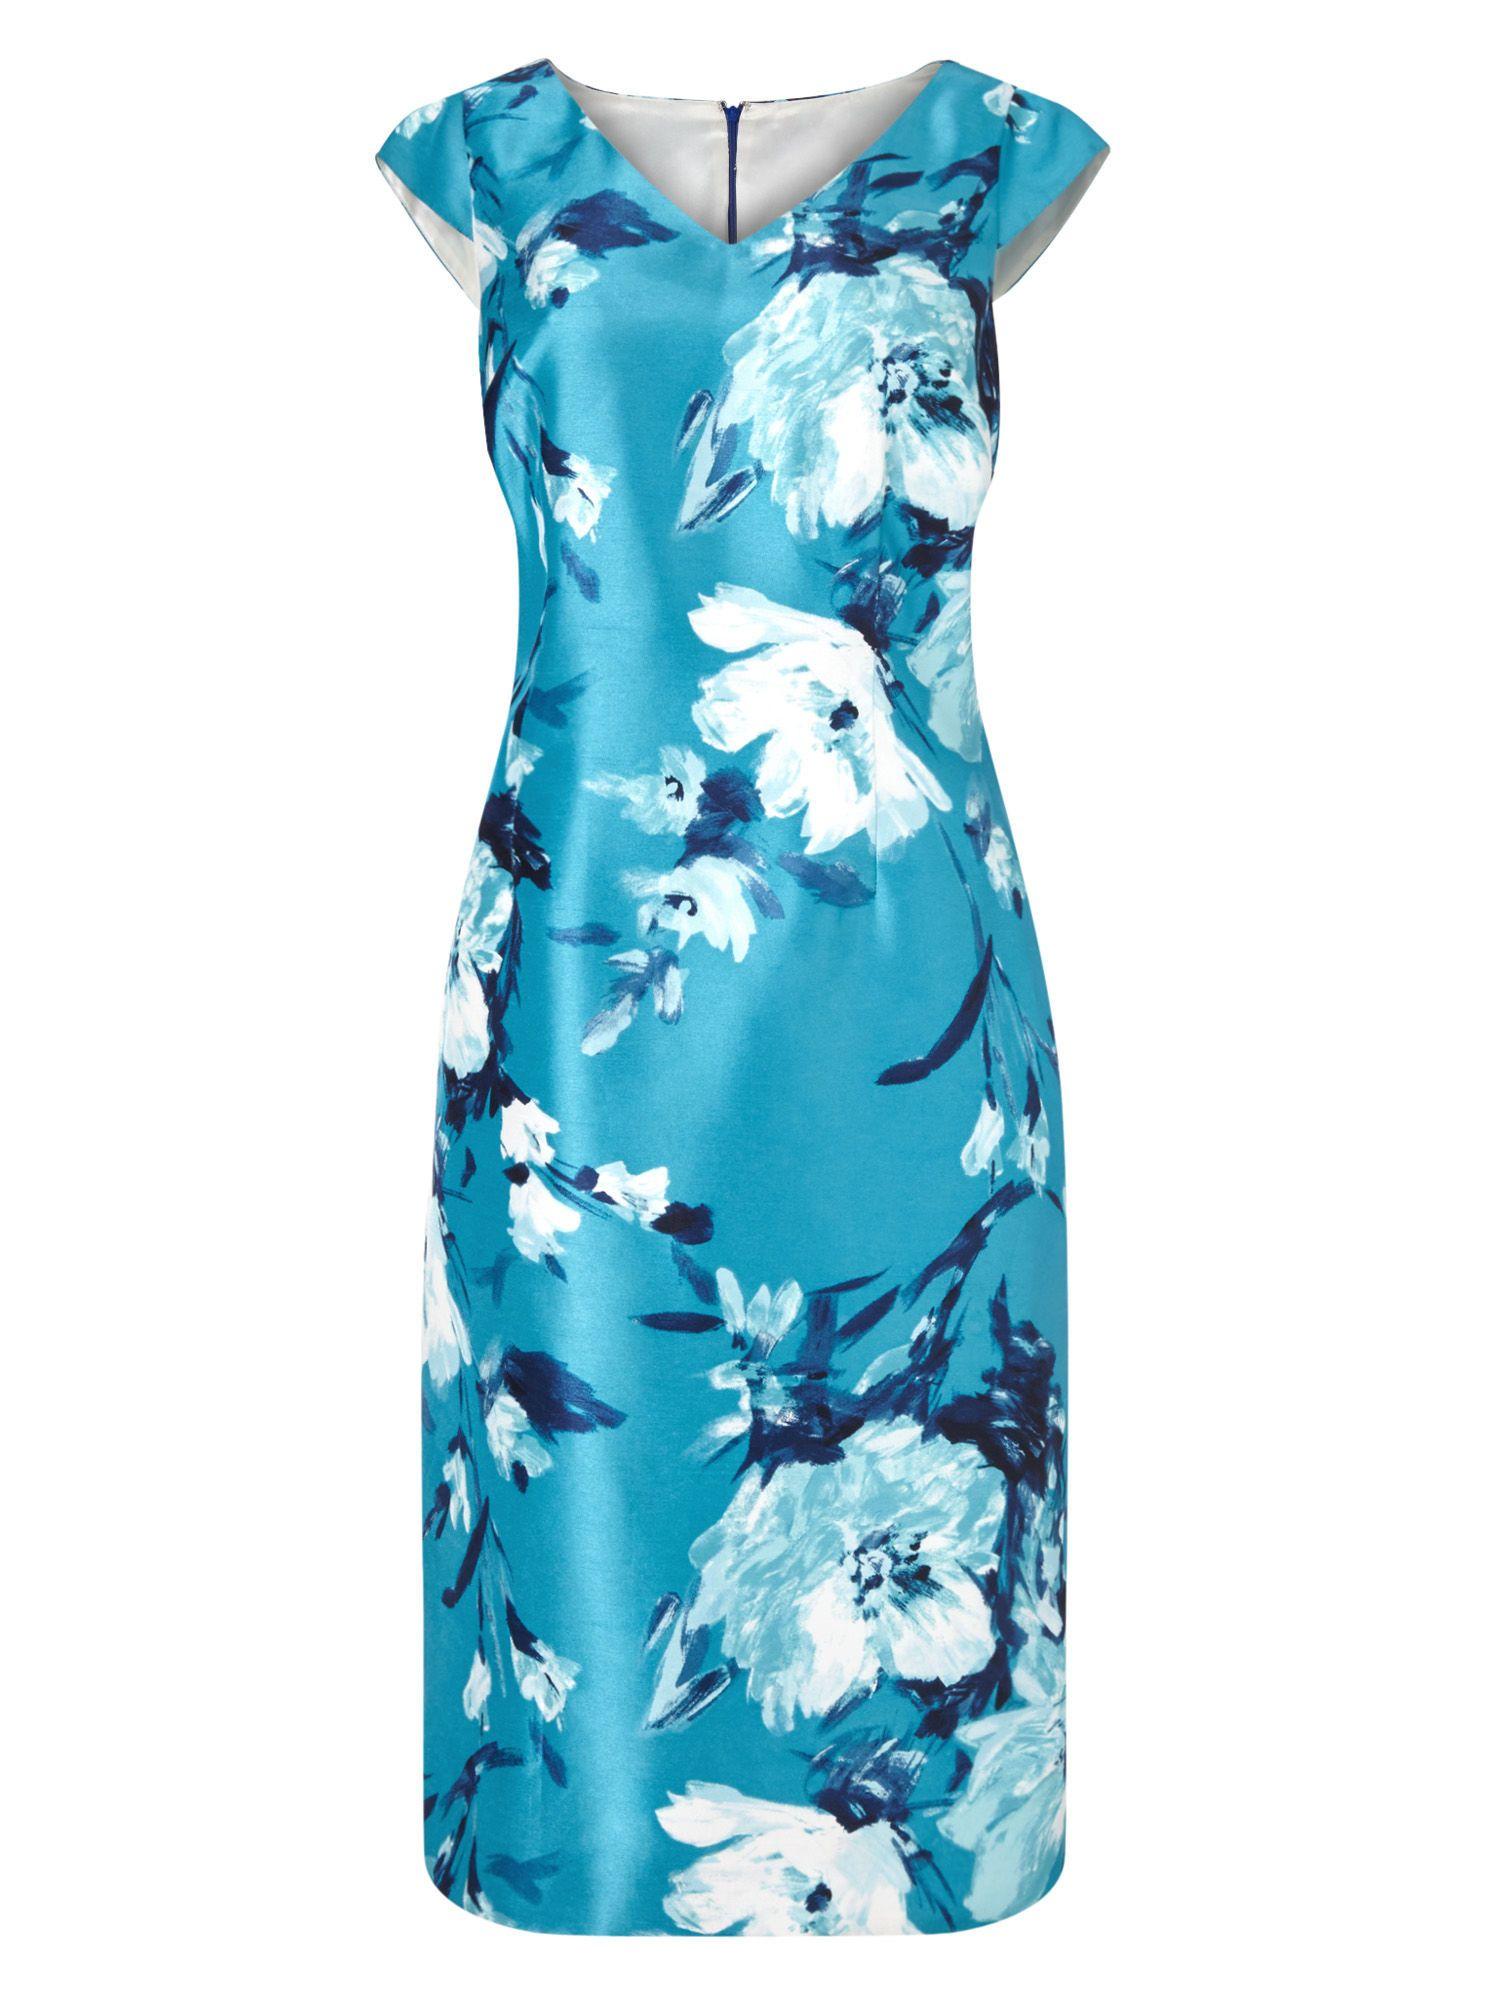 Jacques Vert Large Med Flower Print Dress | Spring Wedding Outfits ...